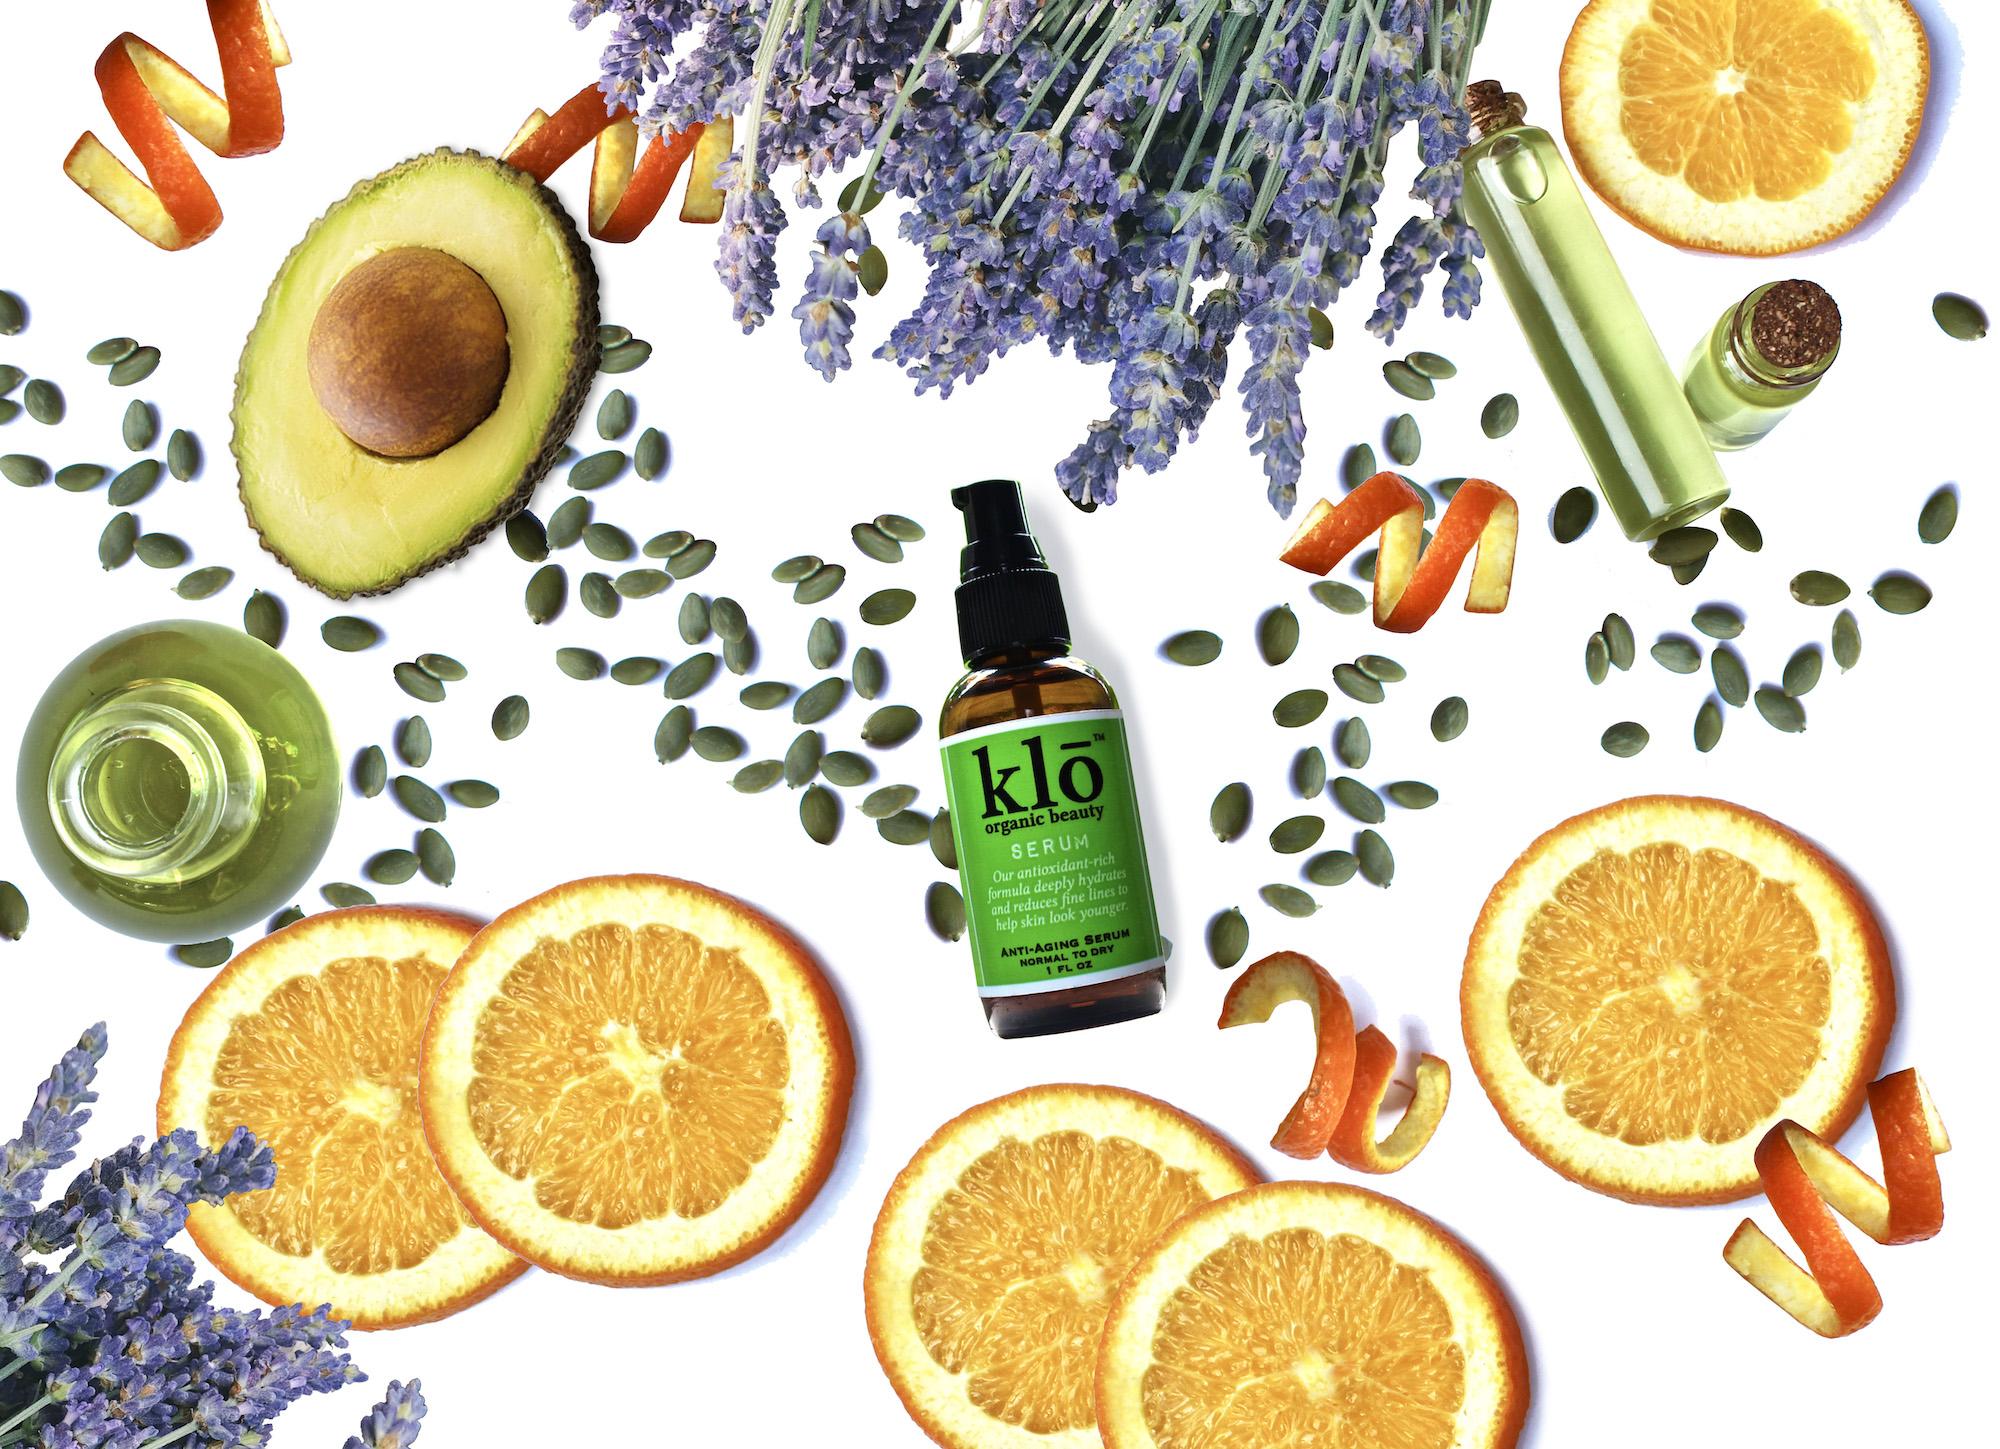 Klō Organic Beauty serum with cut citrus, avocado, and lavender